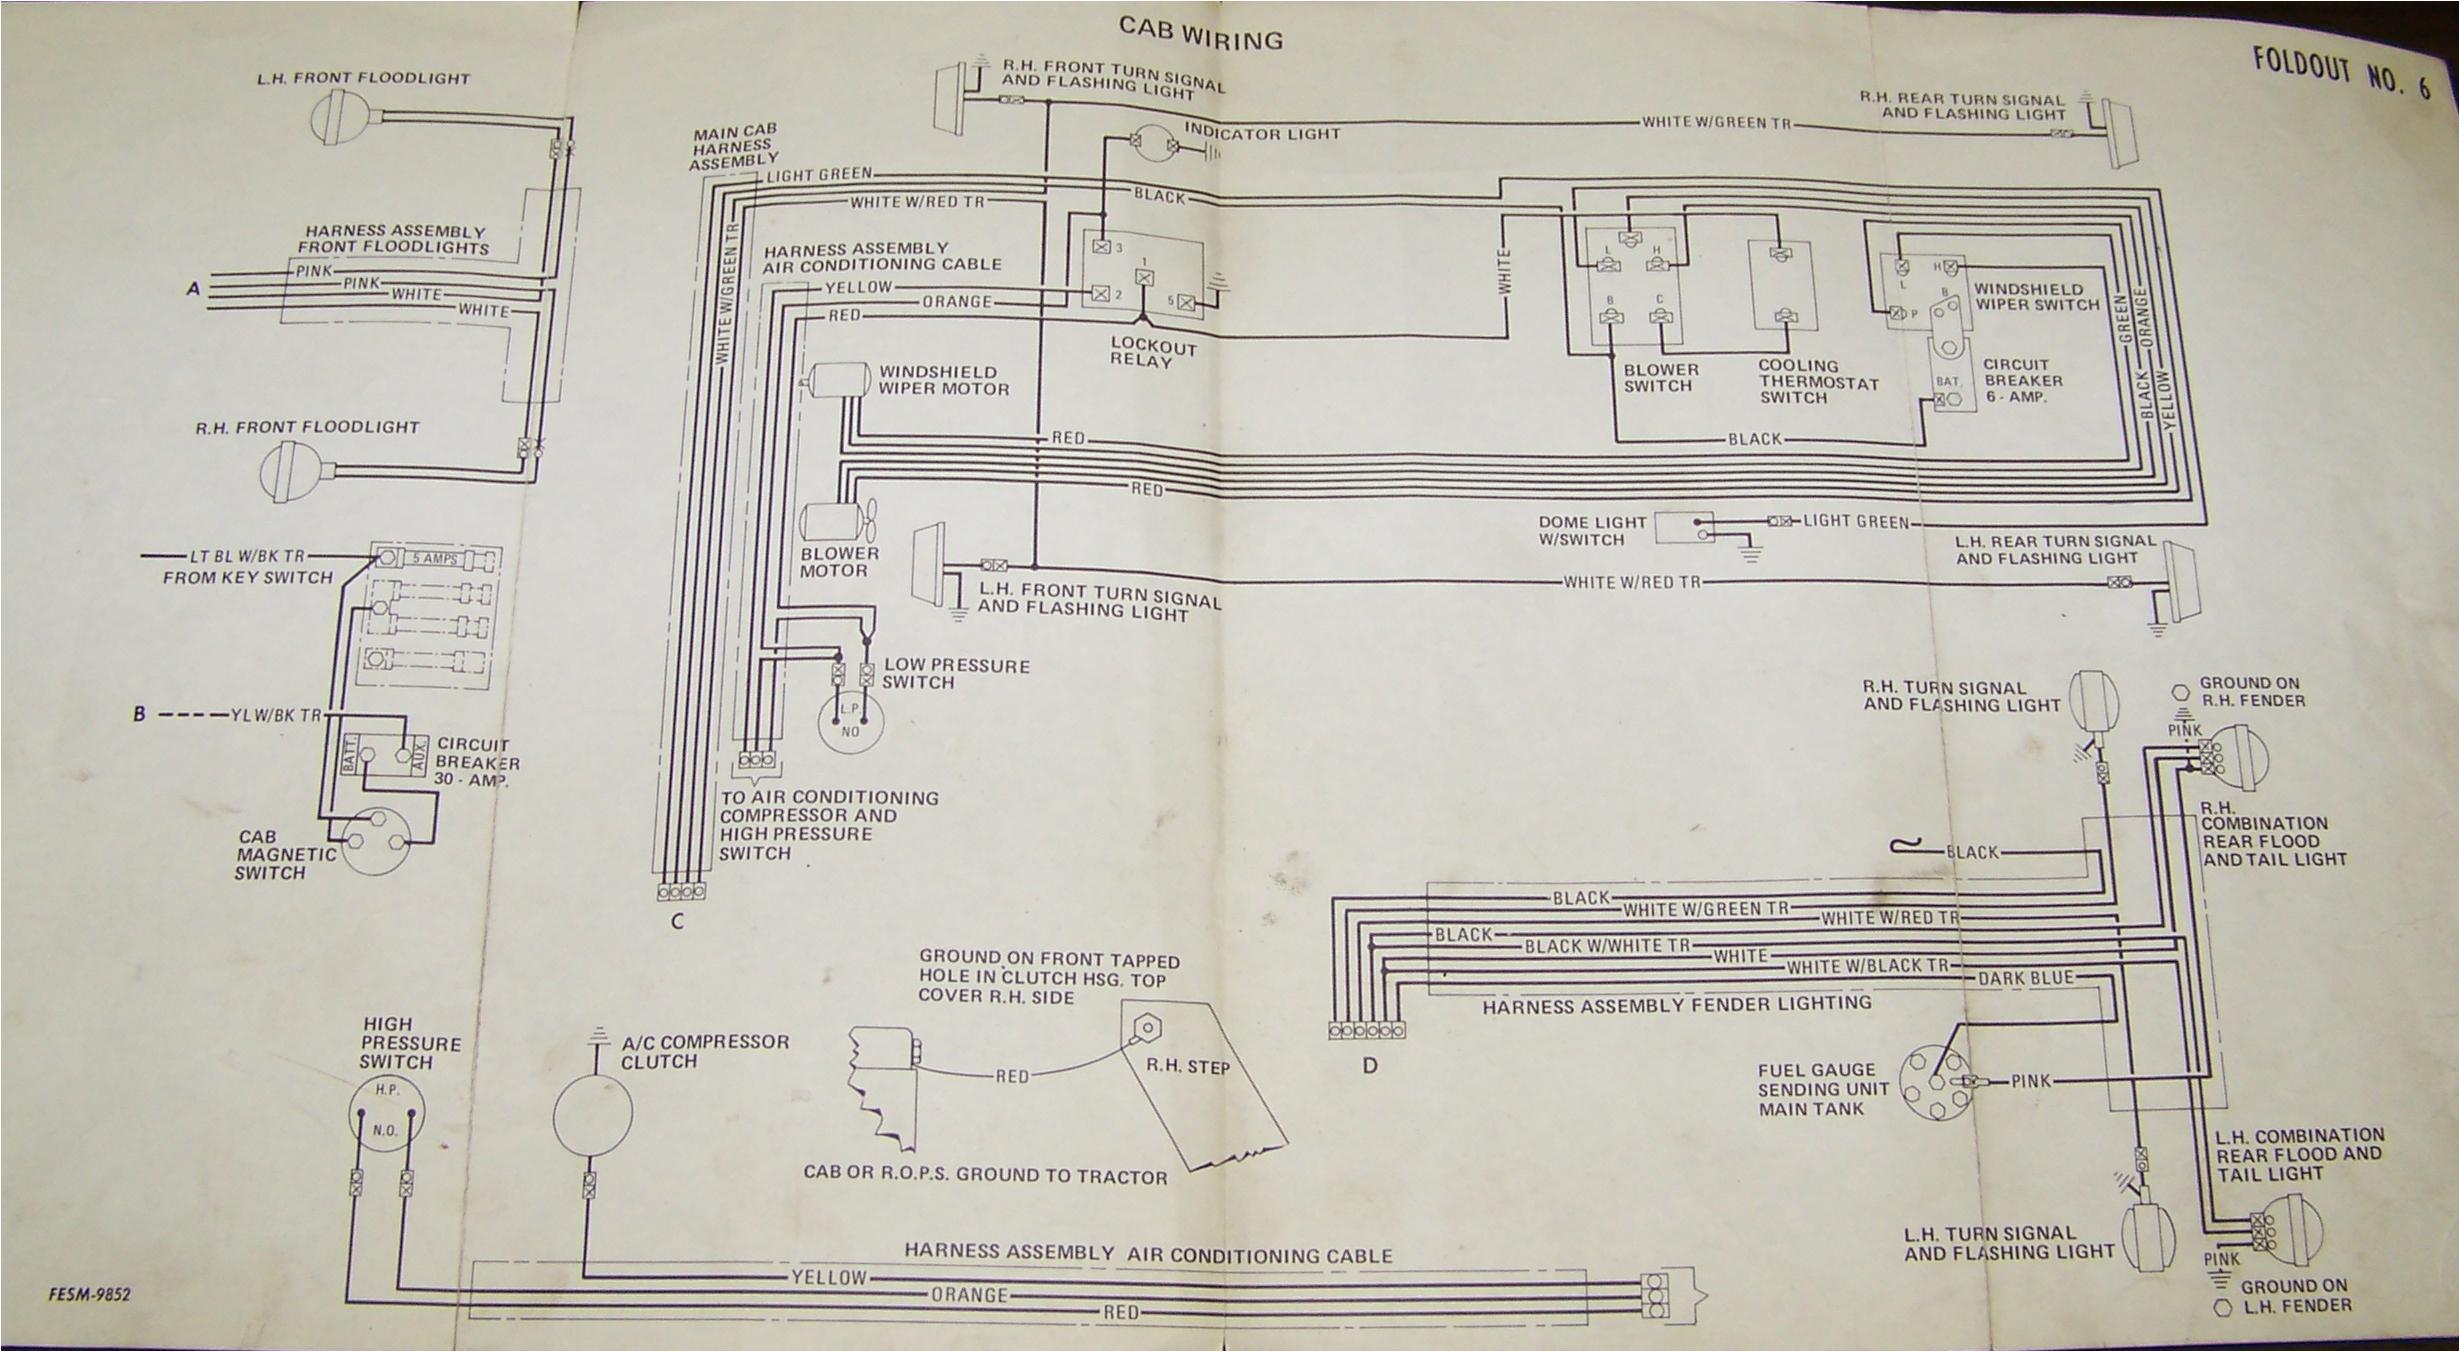 Case Ih 5240 Wiring Diagram Case Ih 5240 Wiring Diagram Data Schematic Diagram